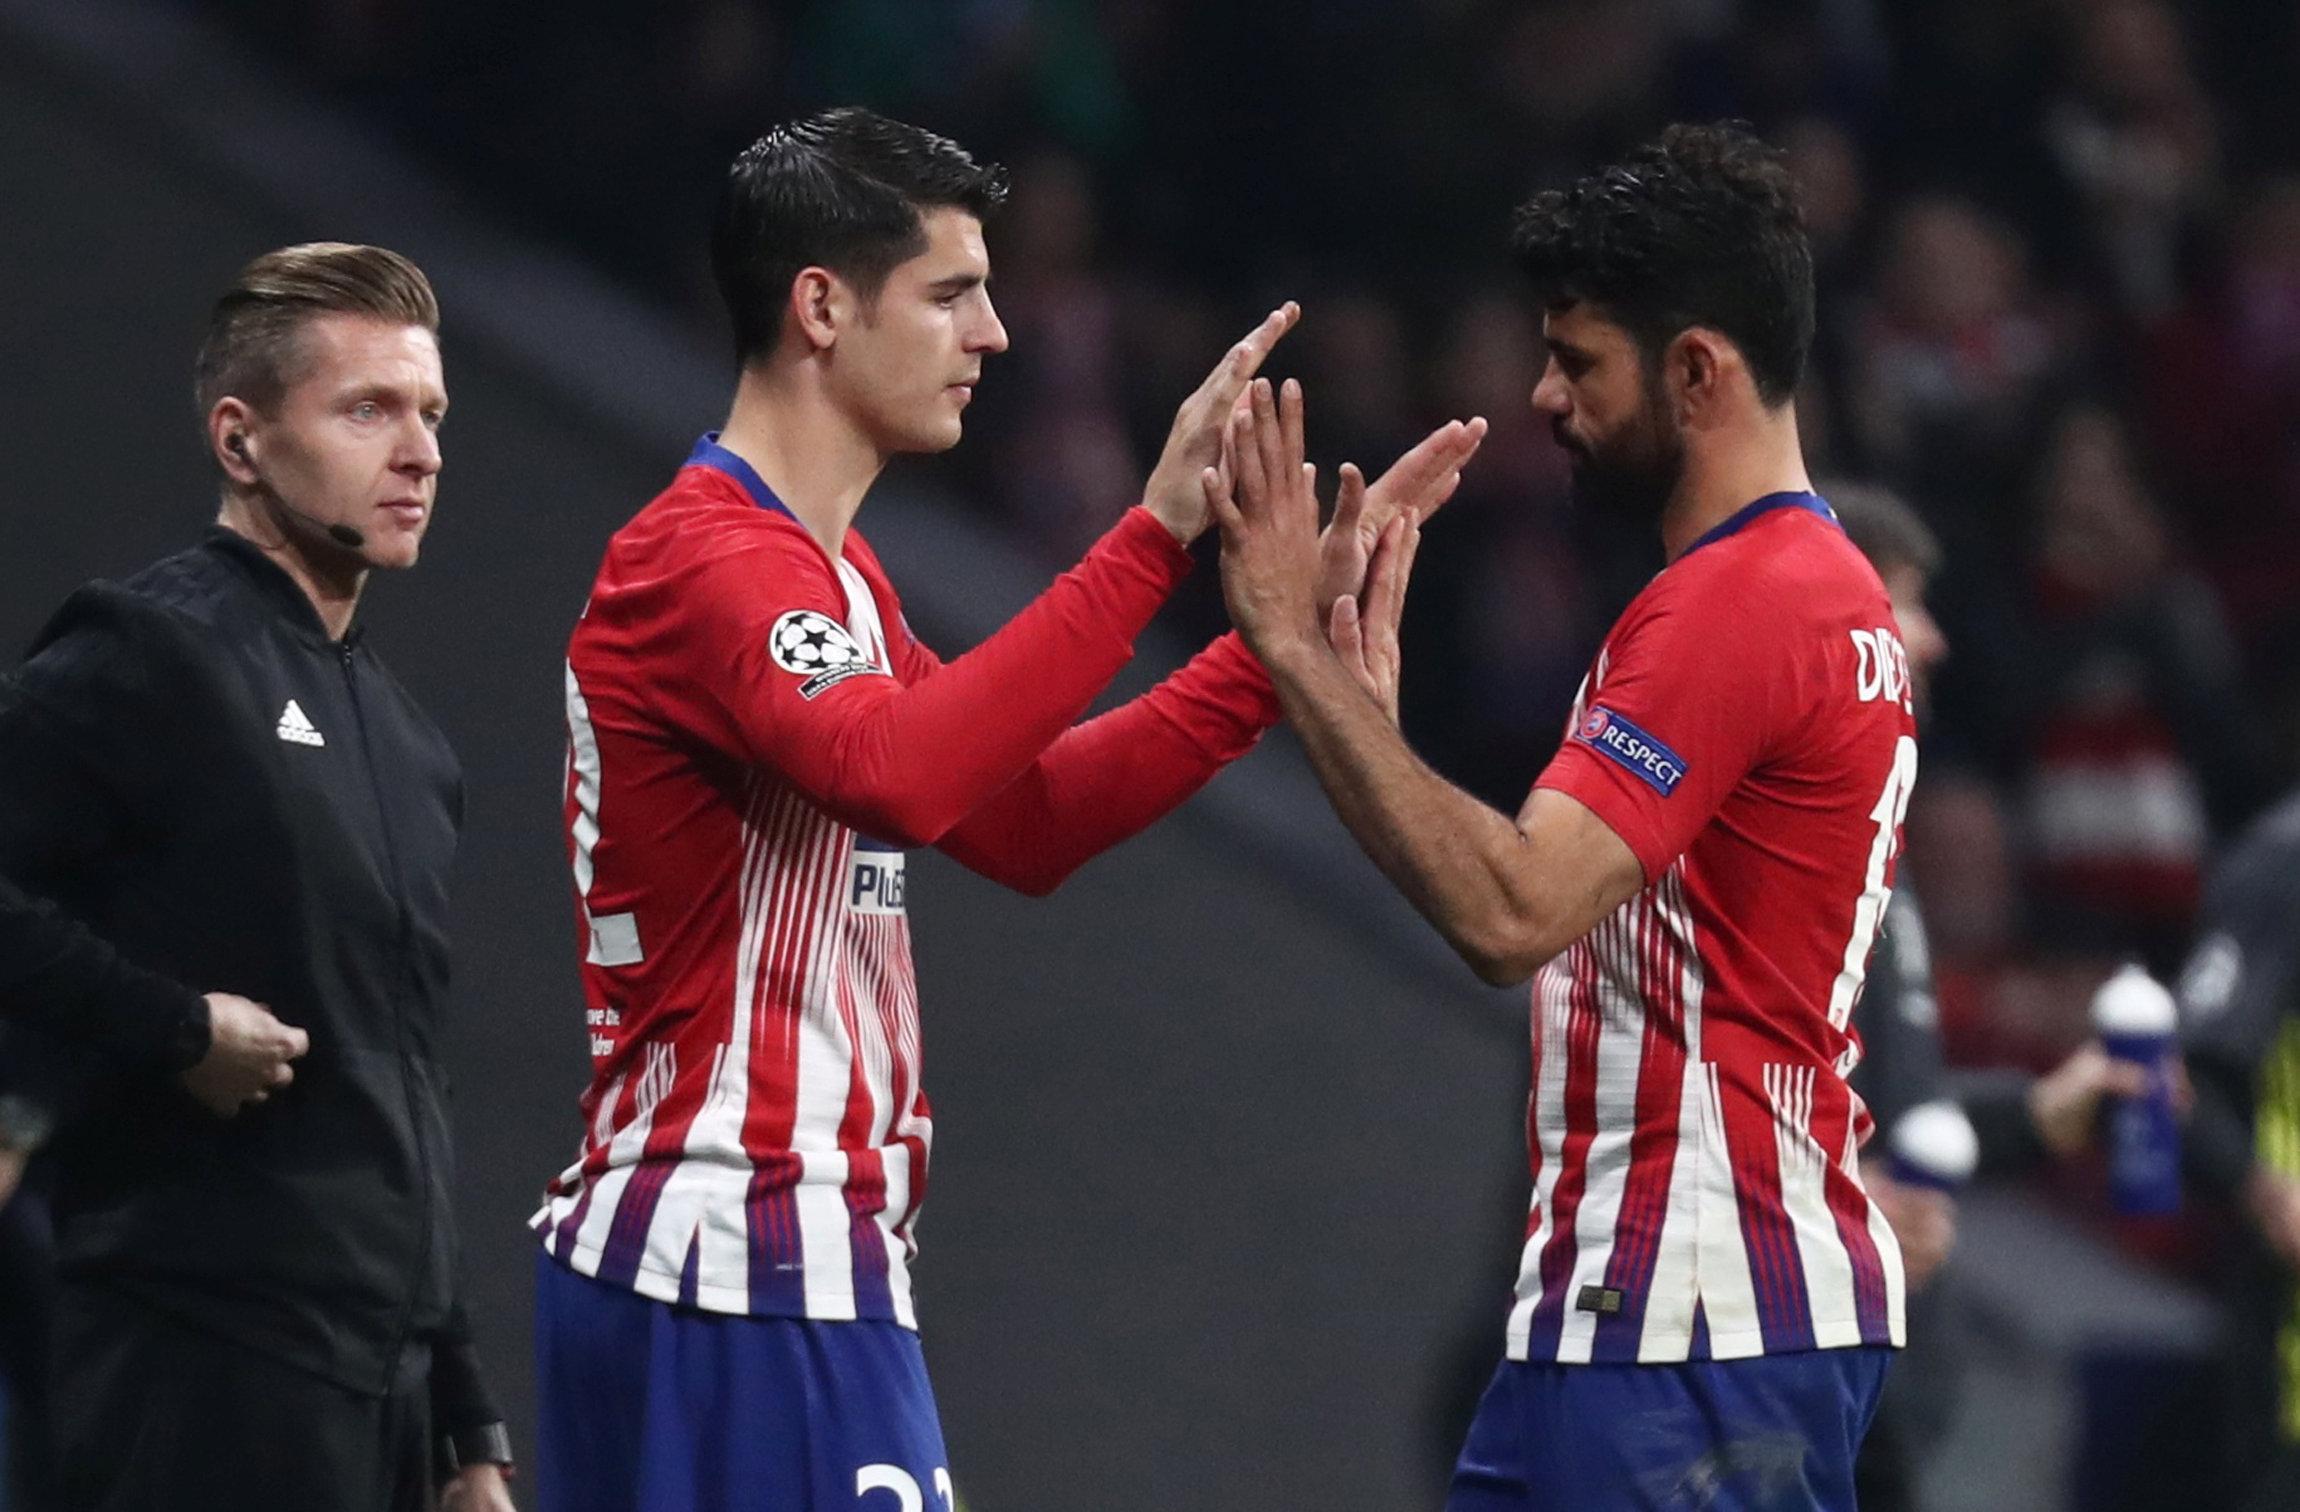 Diego Simeone praises goal-shy Atletico Madrid duo Diego Costa & Alvaro Morata